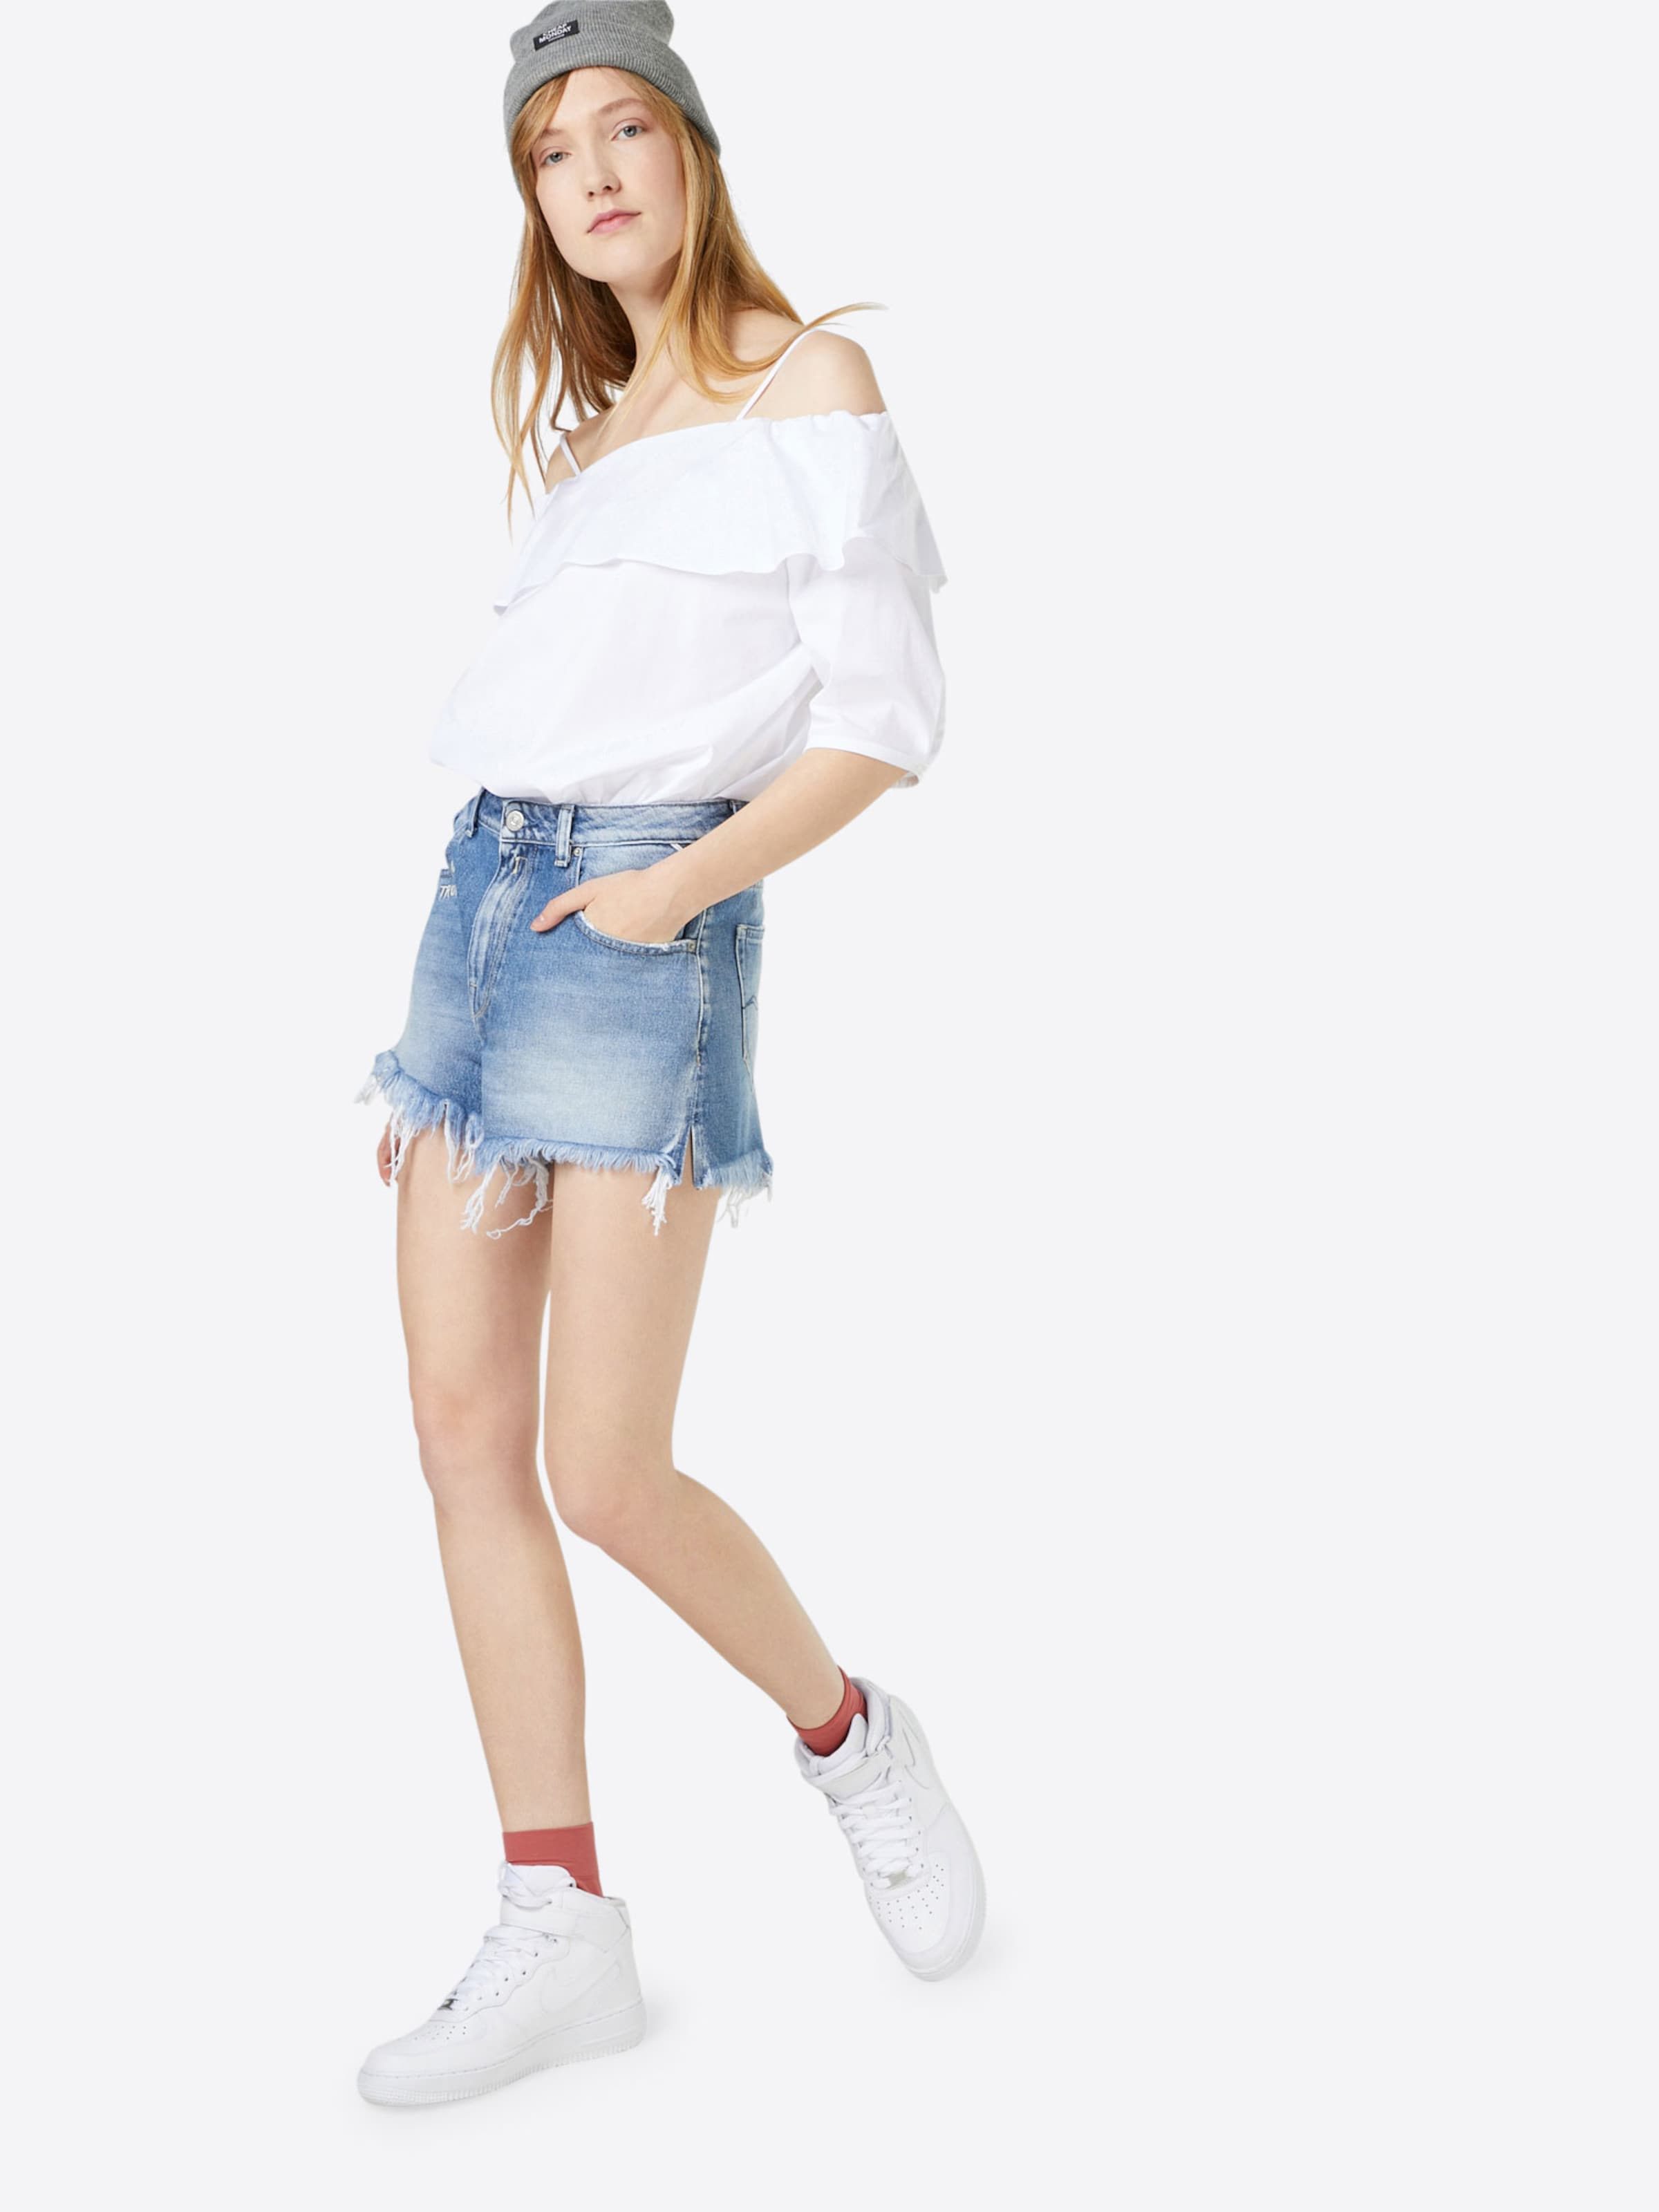 REPLAY Mid Waist Jeans Short Versand Outlet-Store Online 2018 Neuer Günstiger Preis Großer Verkauf Online 33qKIW